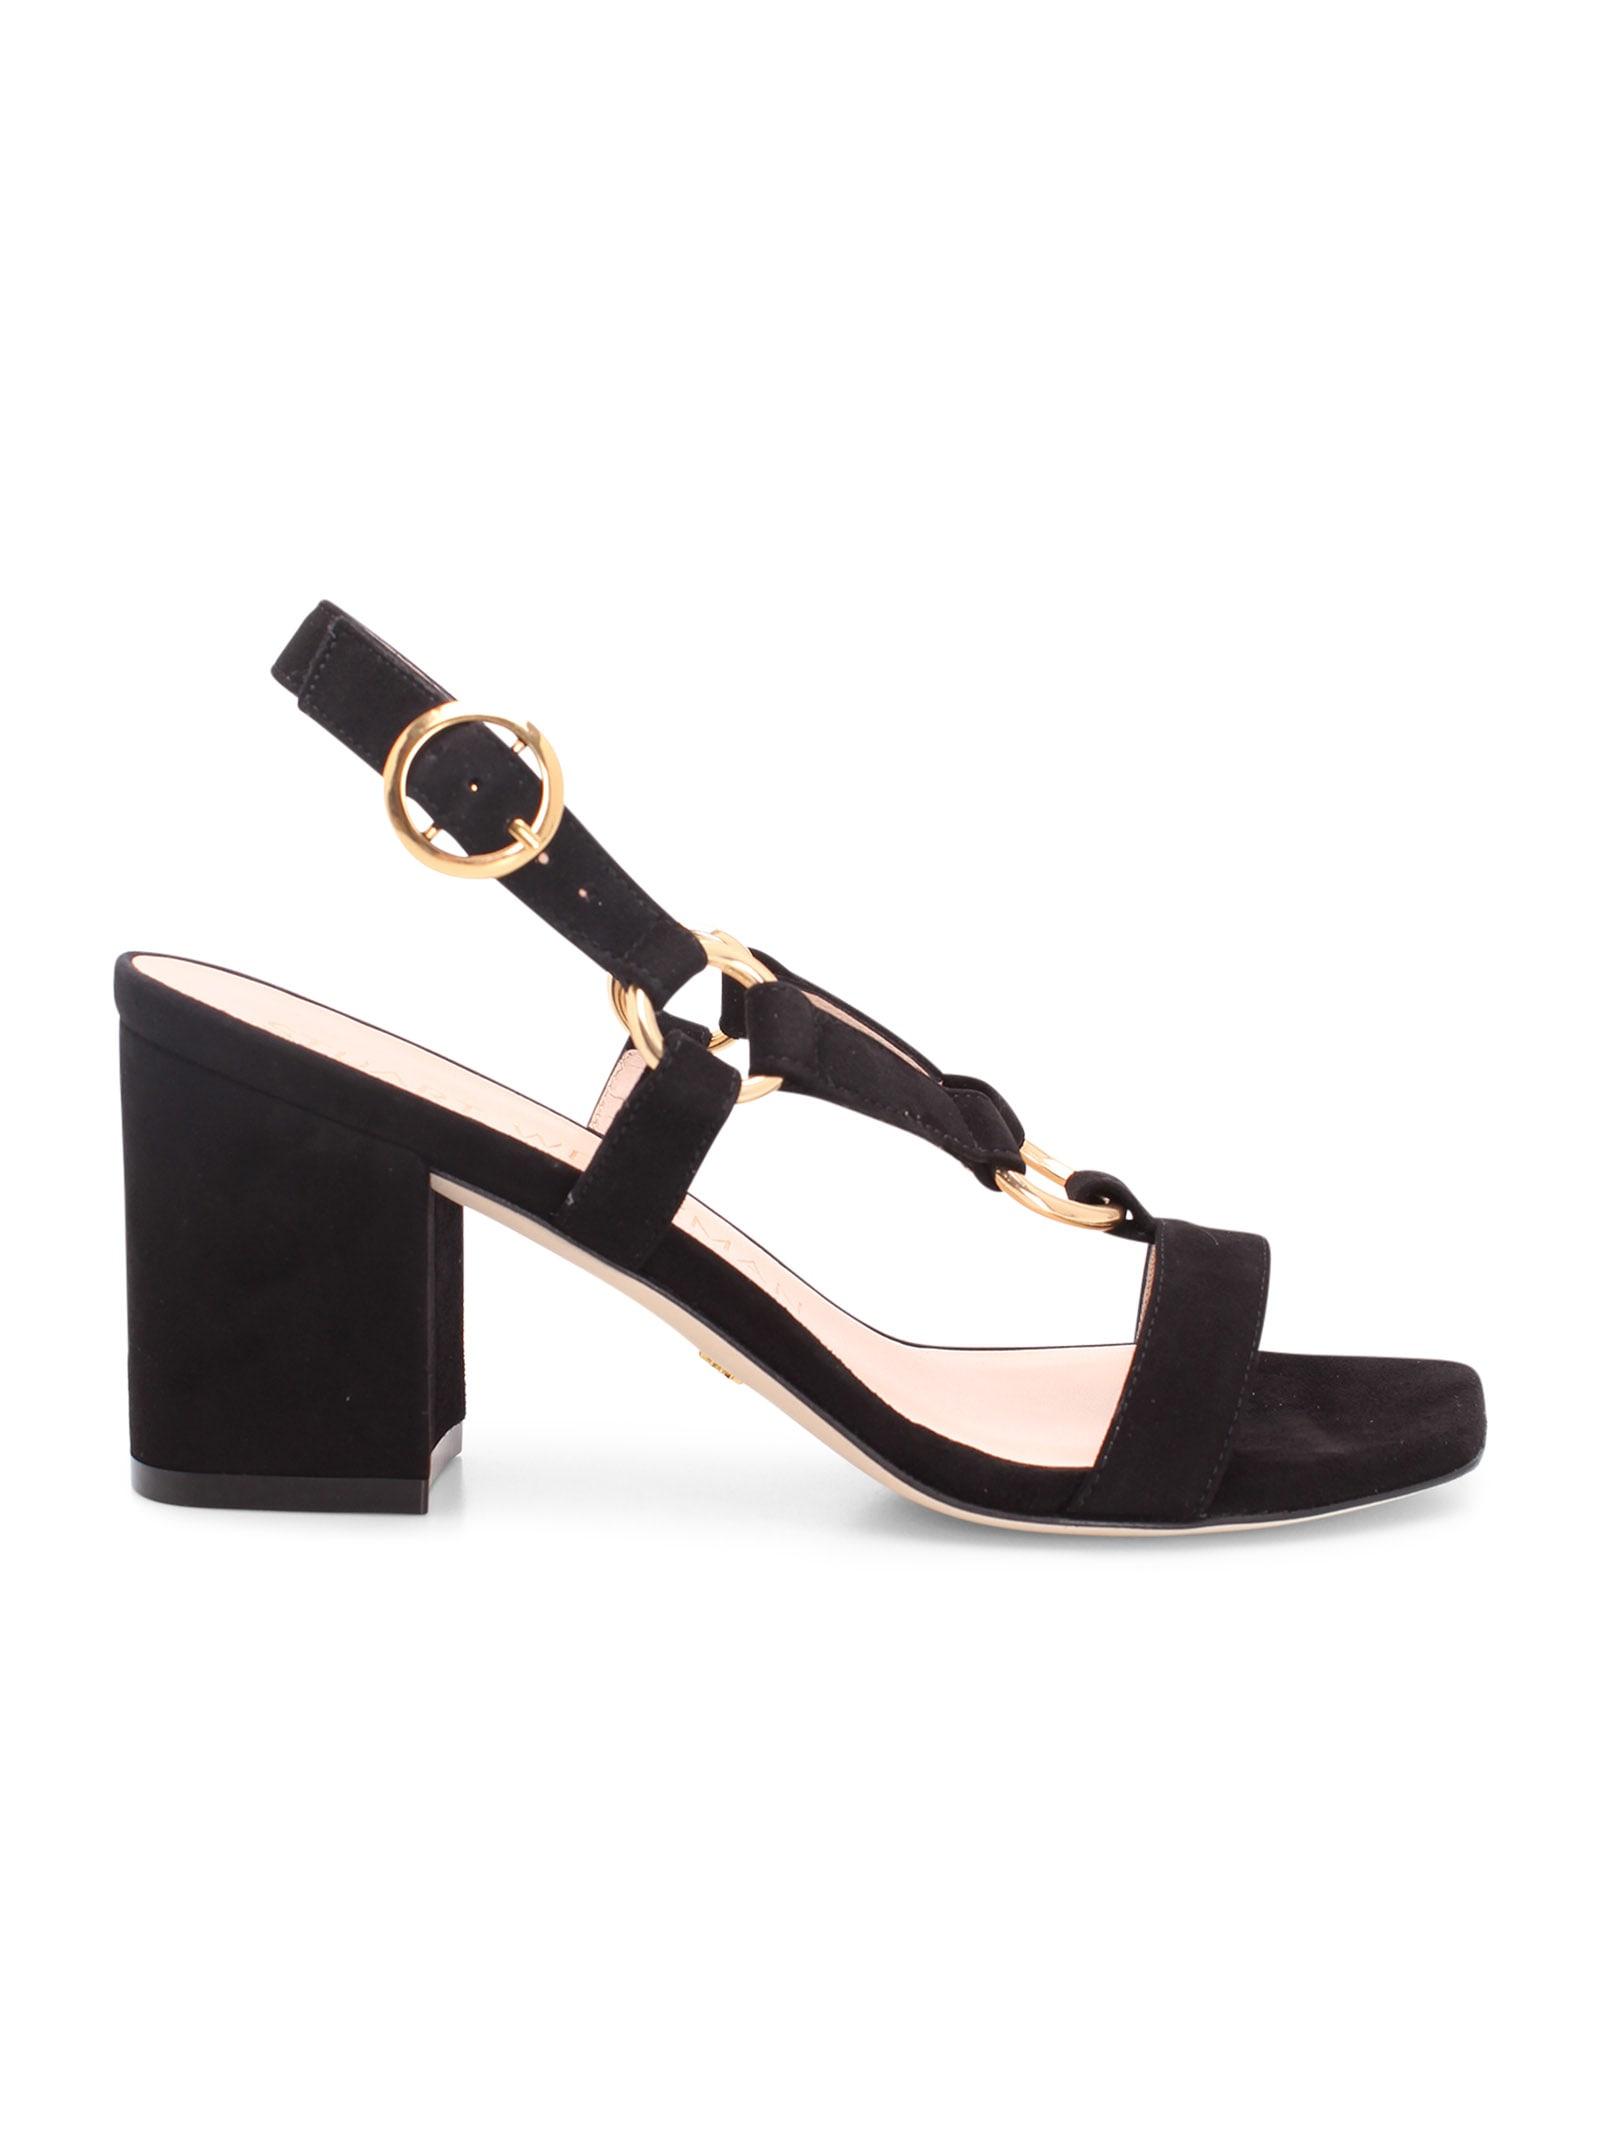 Buy Stuart Weitzman lalita Leather Sandals online, shop Stuart Weitzman shoes with free shipping